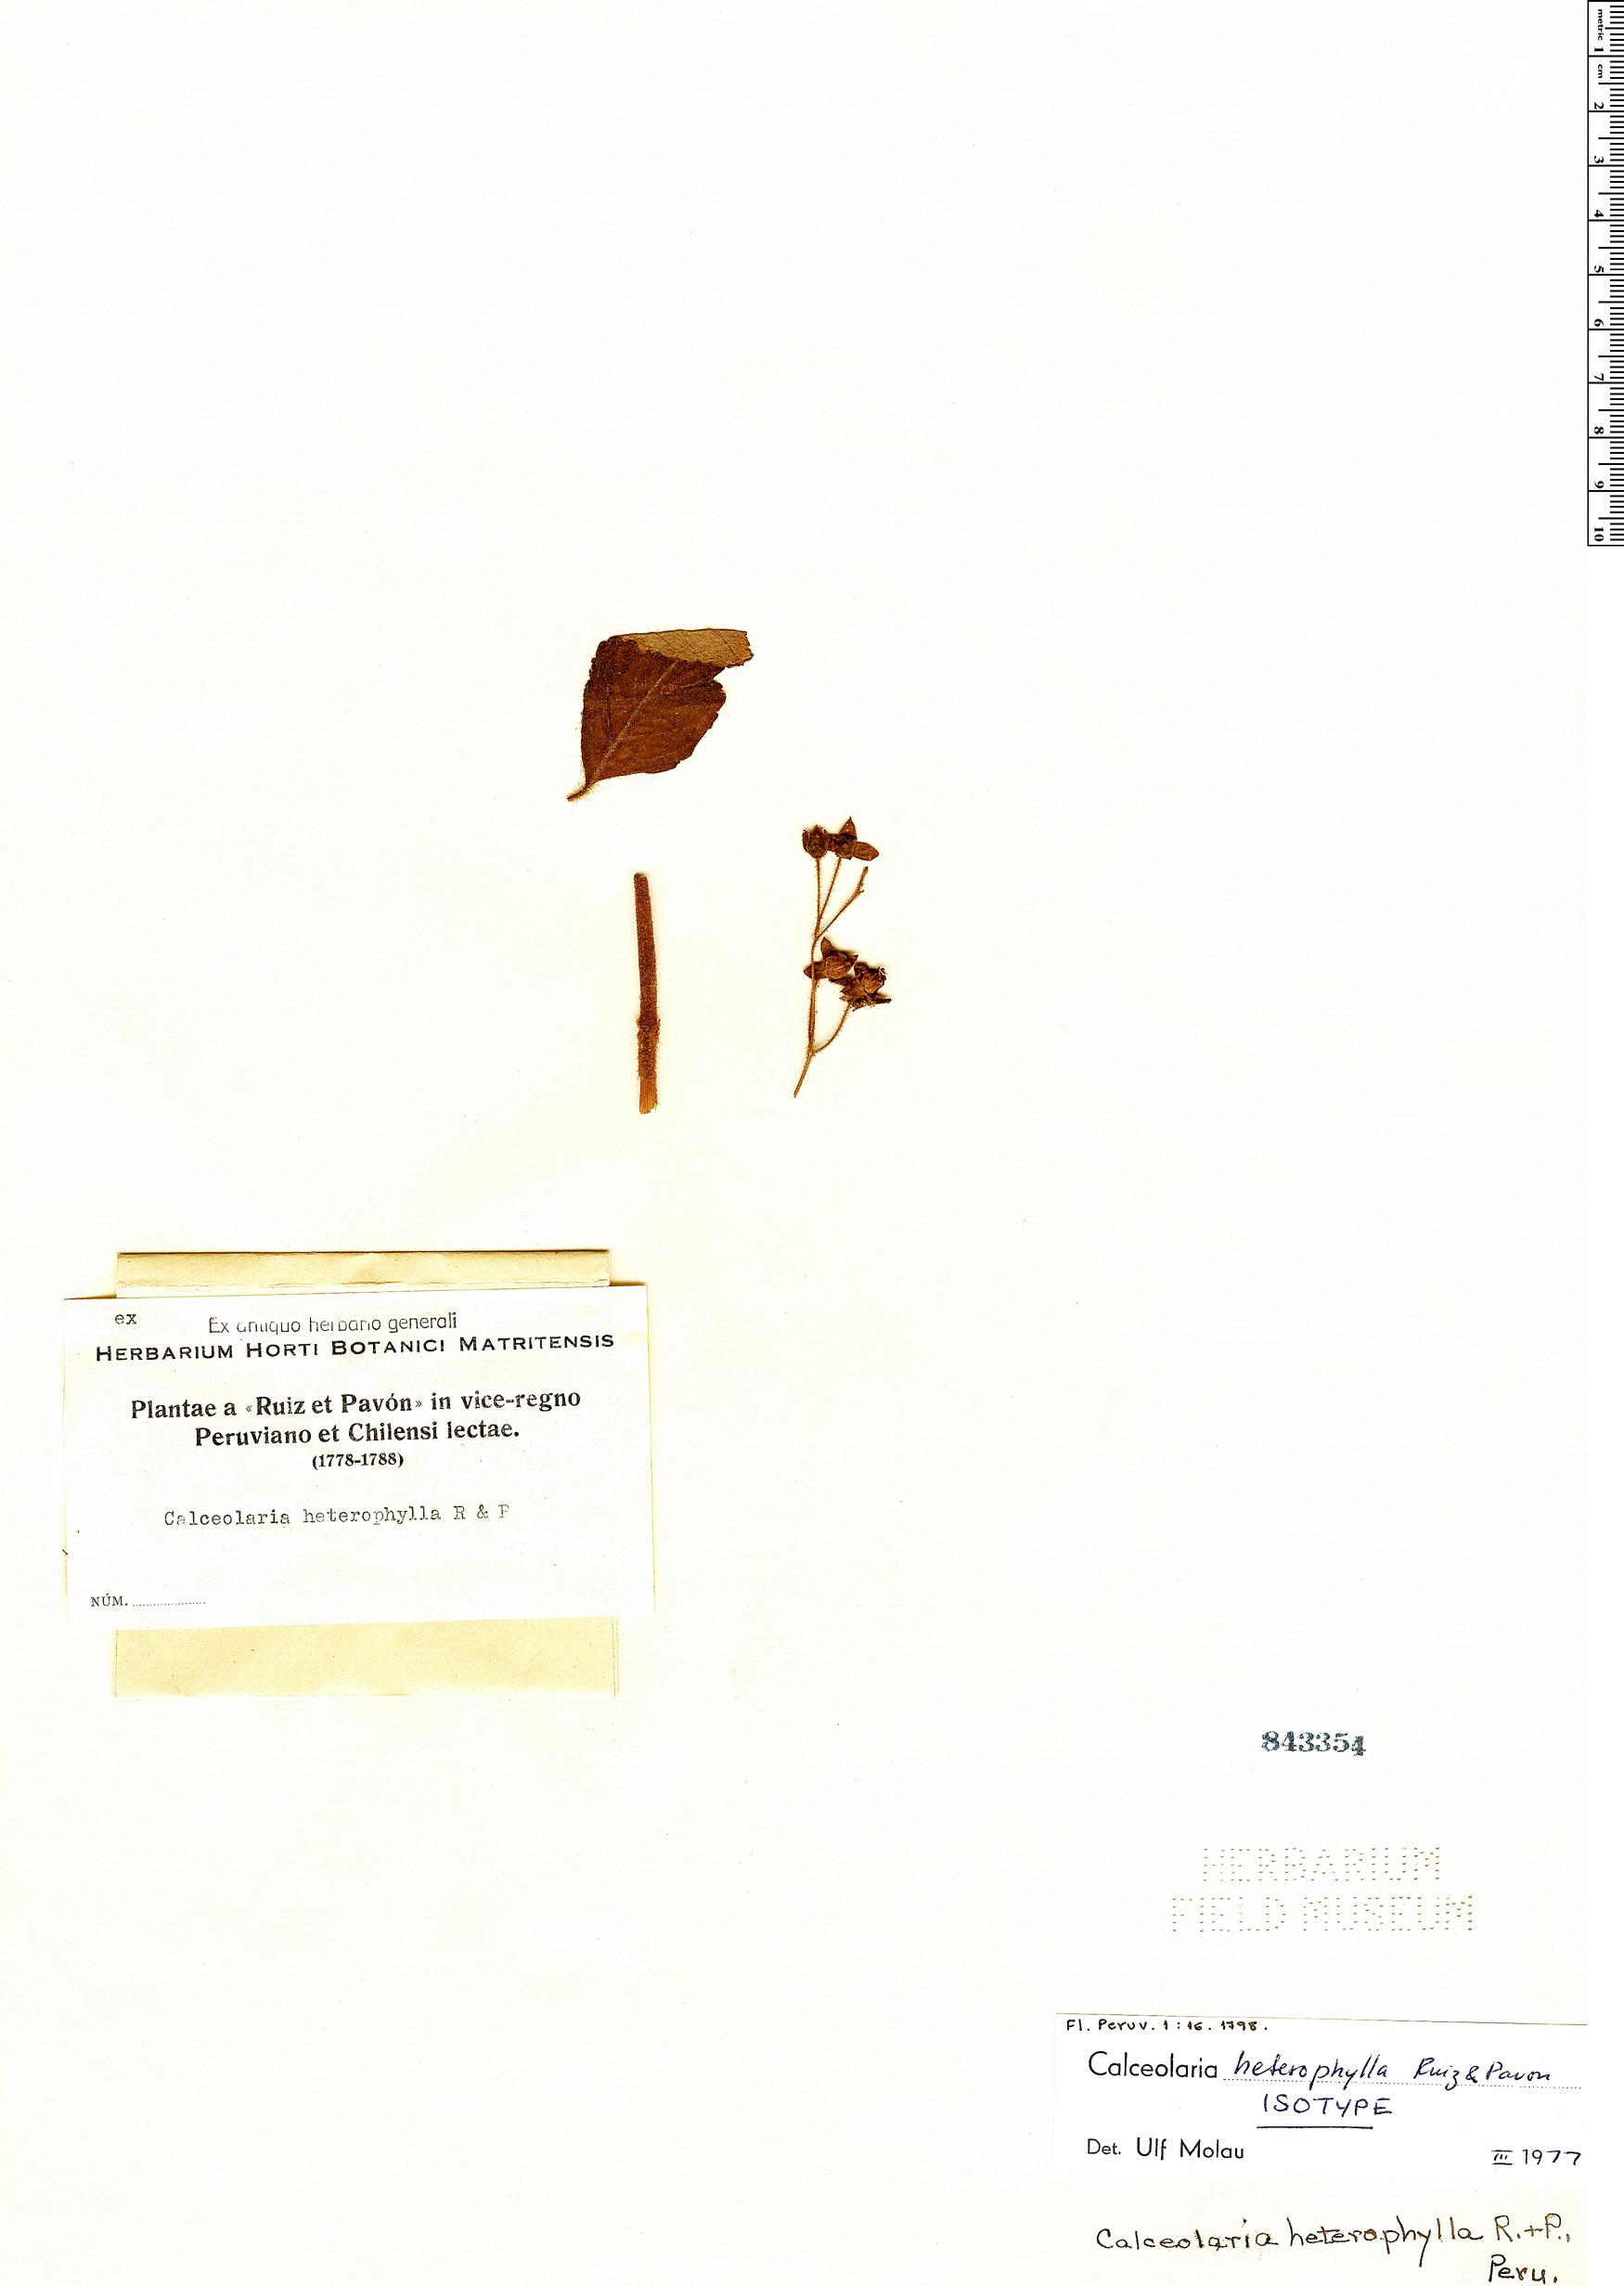 Espécime: Calceolaria heterophylla